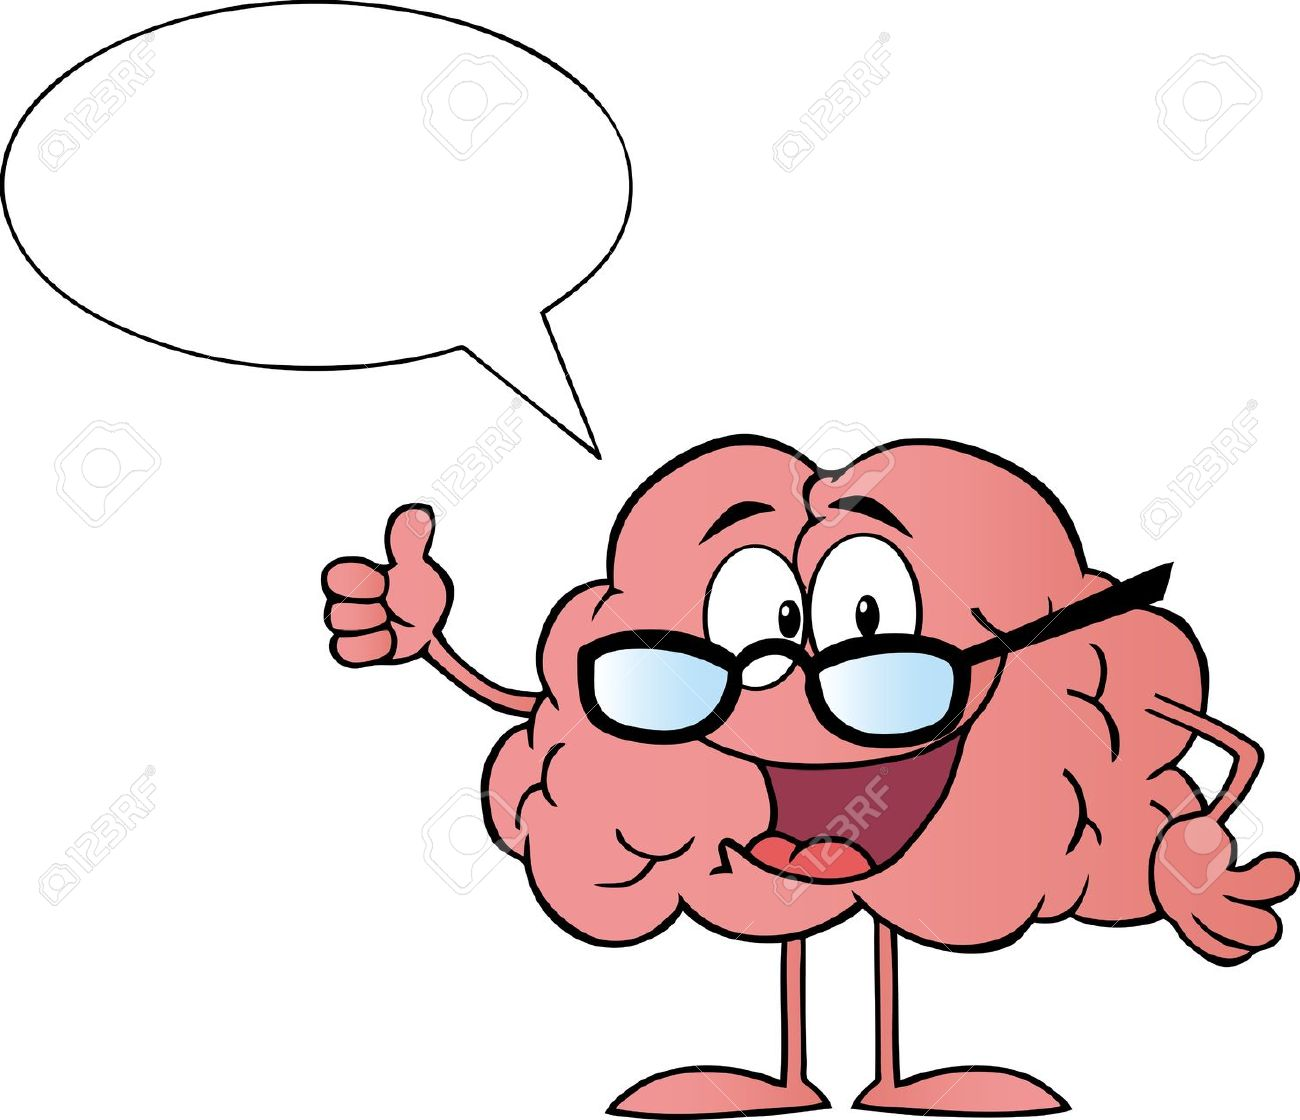 Cute Brain Clipart   Free download best Cute Brain Clipart ...